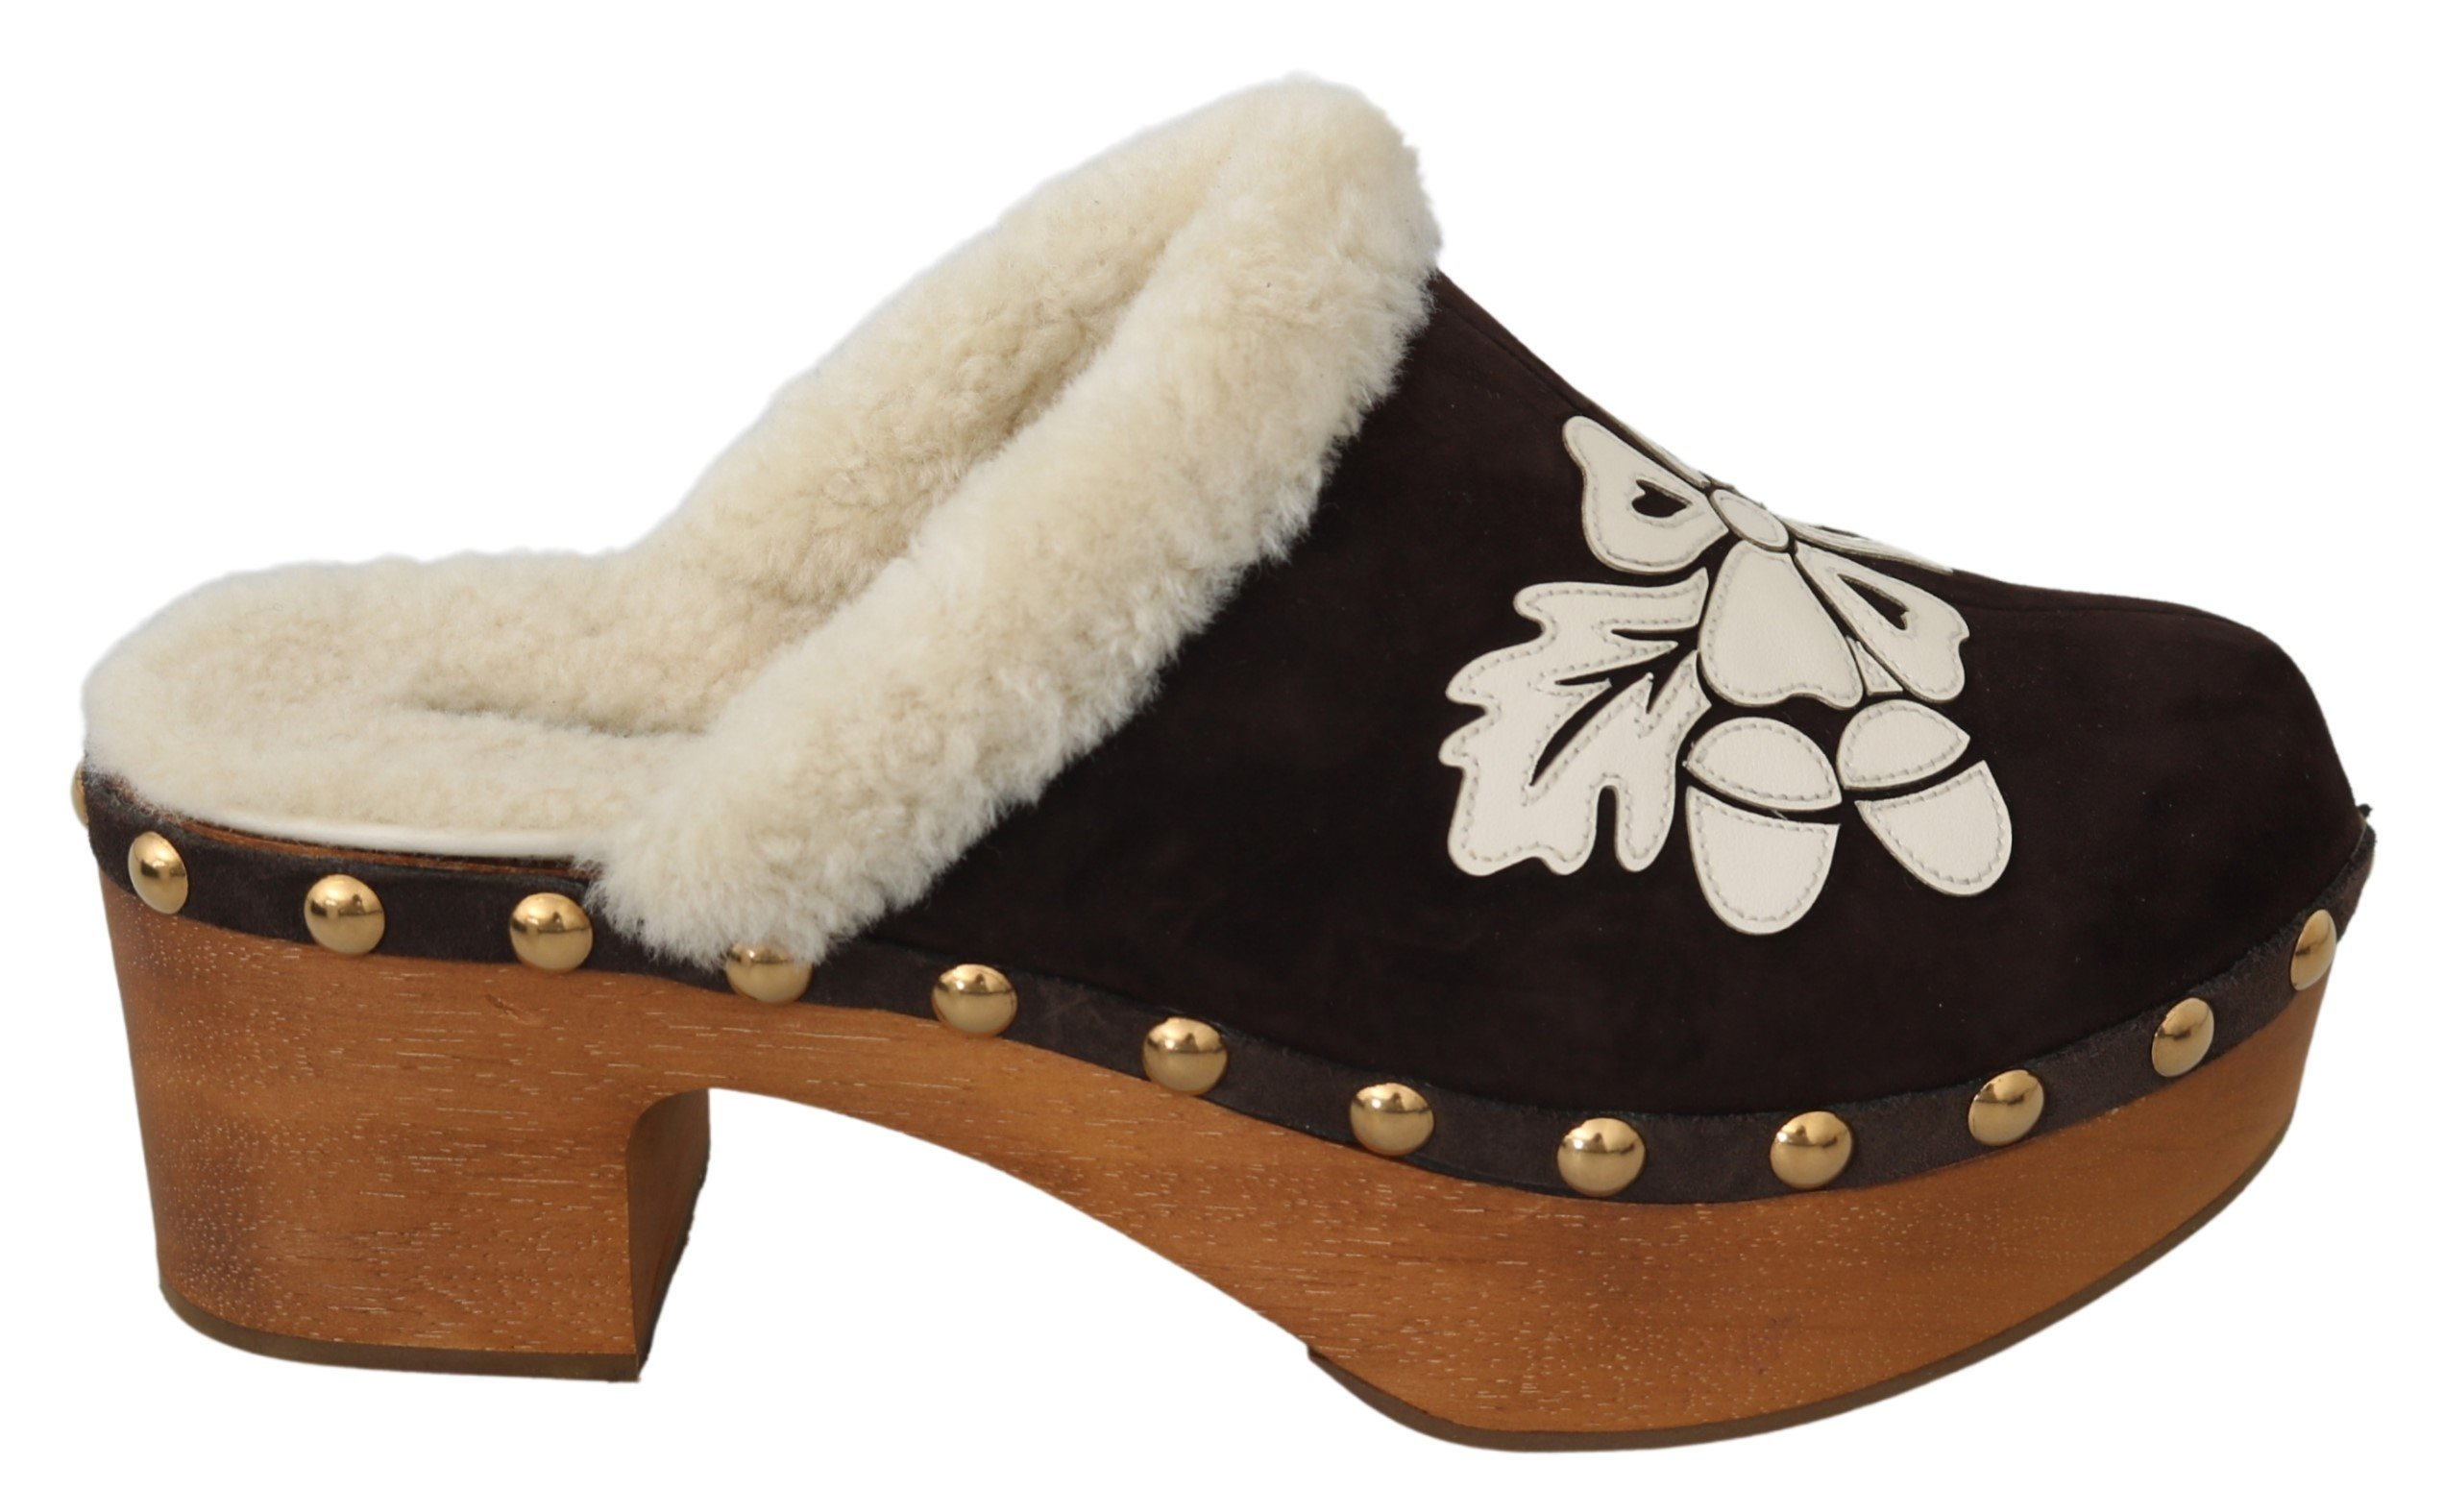 Dolce & Gabbana Women's Suede Shearling Sandals Brown LA7078 - EU39/US8.5